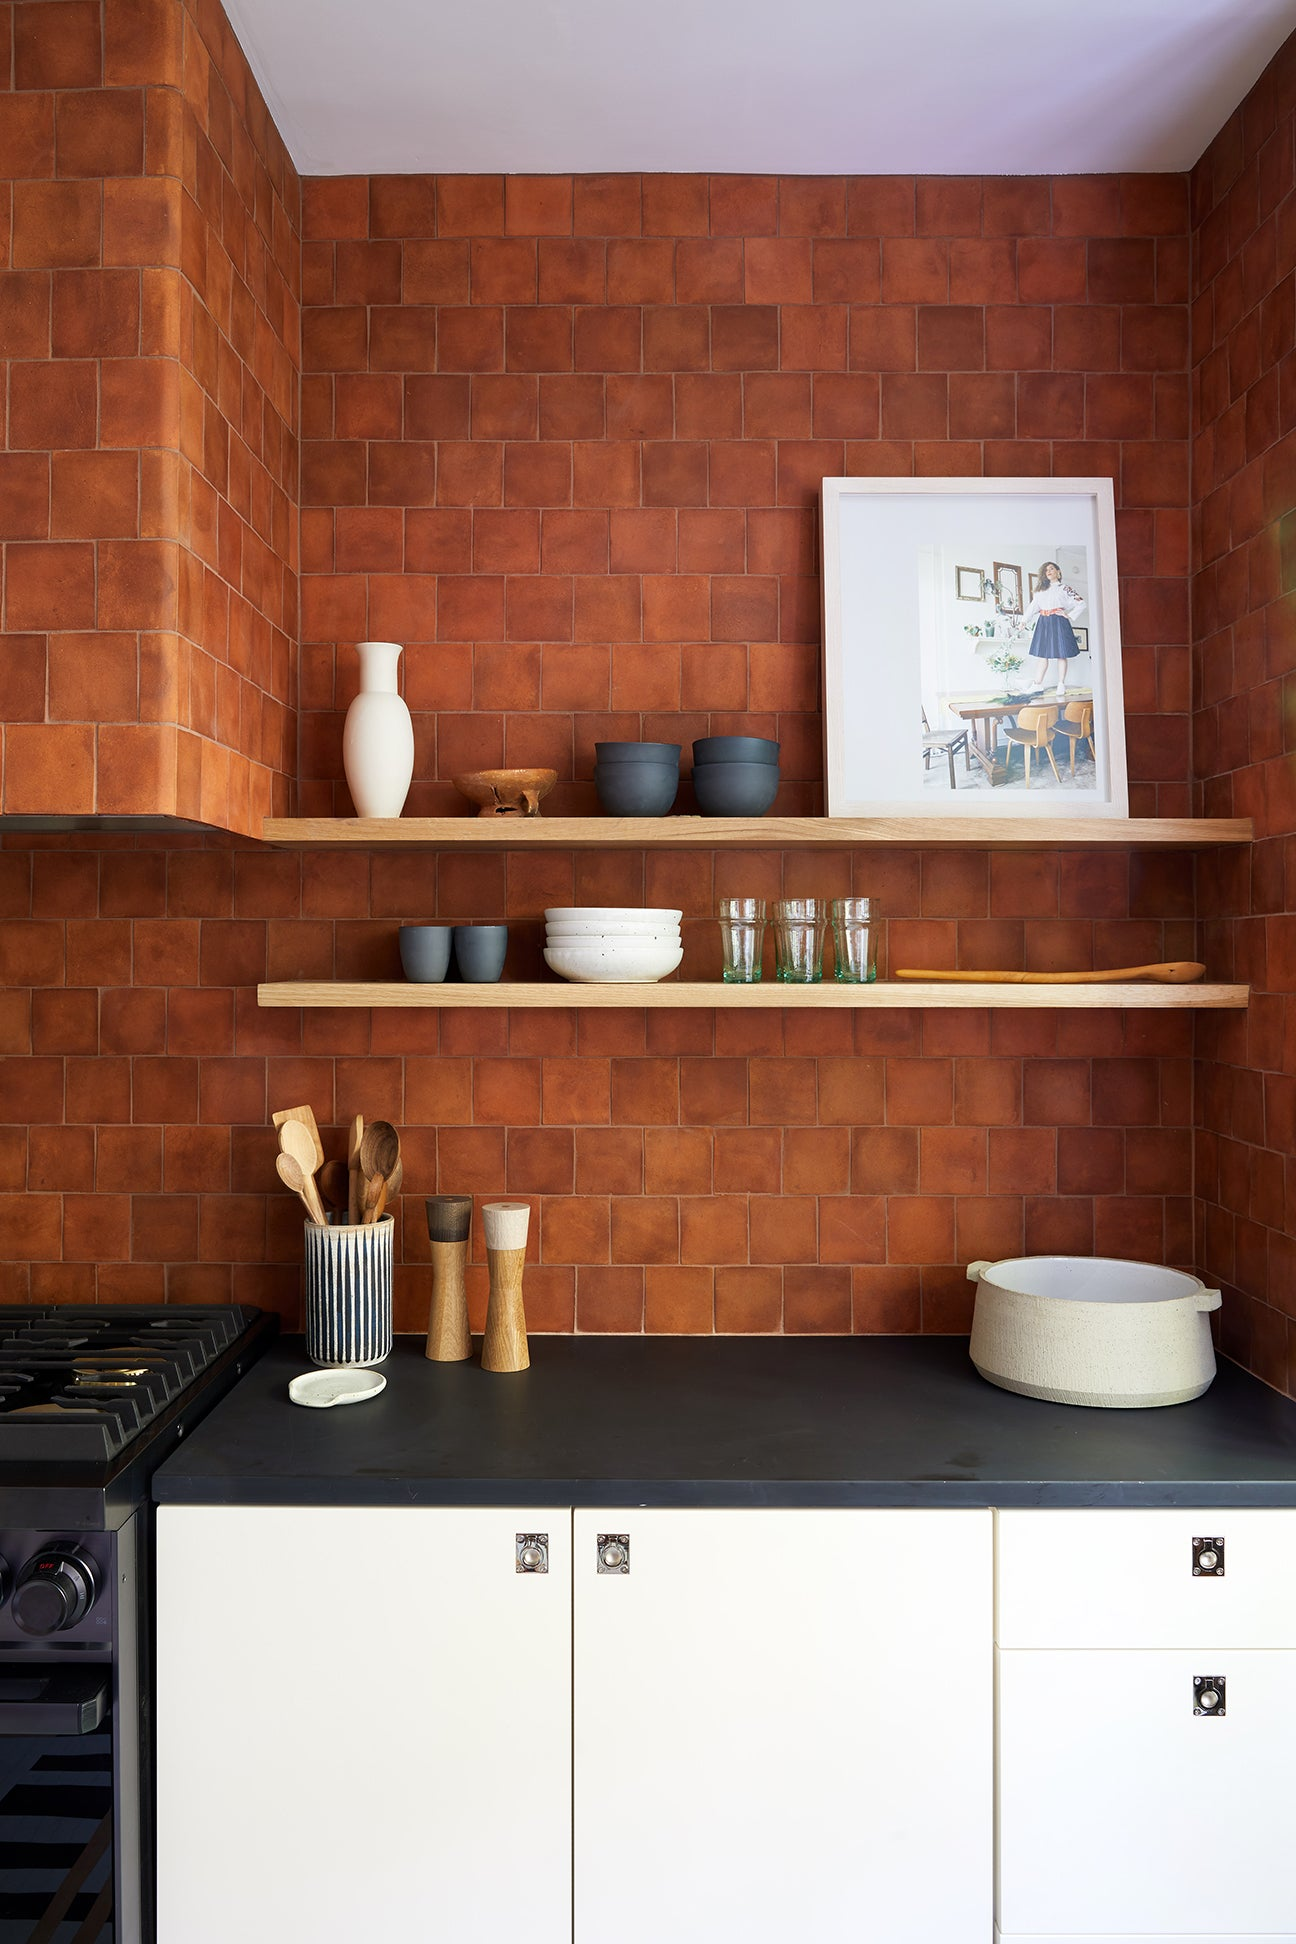 Modern Kitchen With Terra Cotta Tile